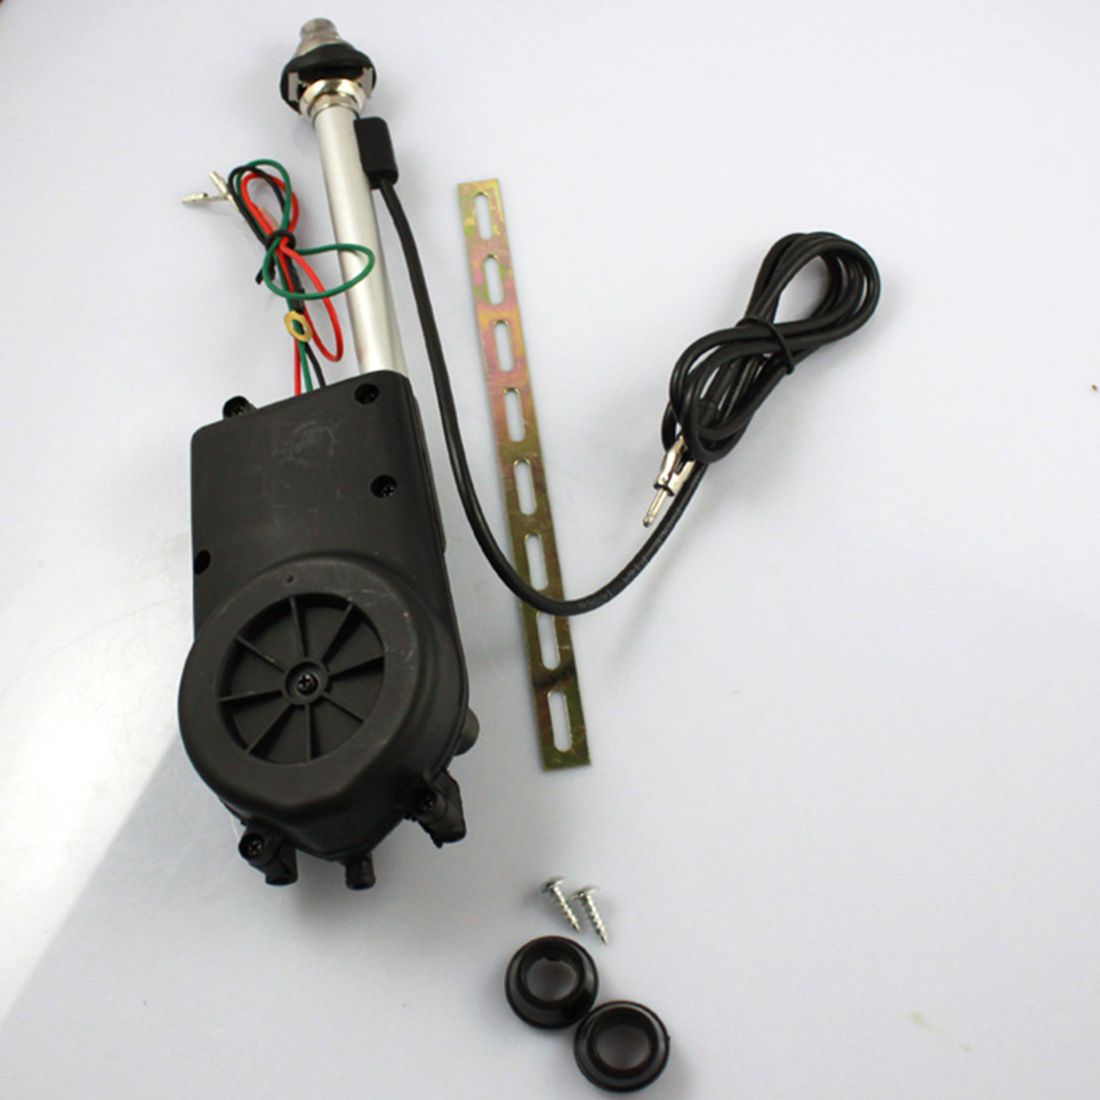 medium resolution of marsnaska universal car antenna electric power antenna replacement kit vehicle am fm radio mast aerial car accessories